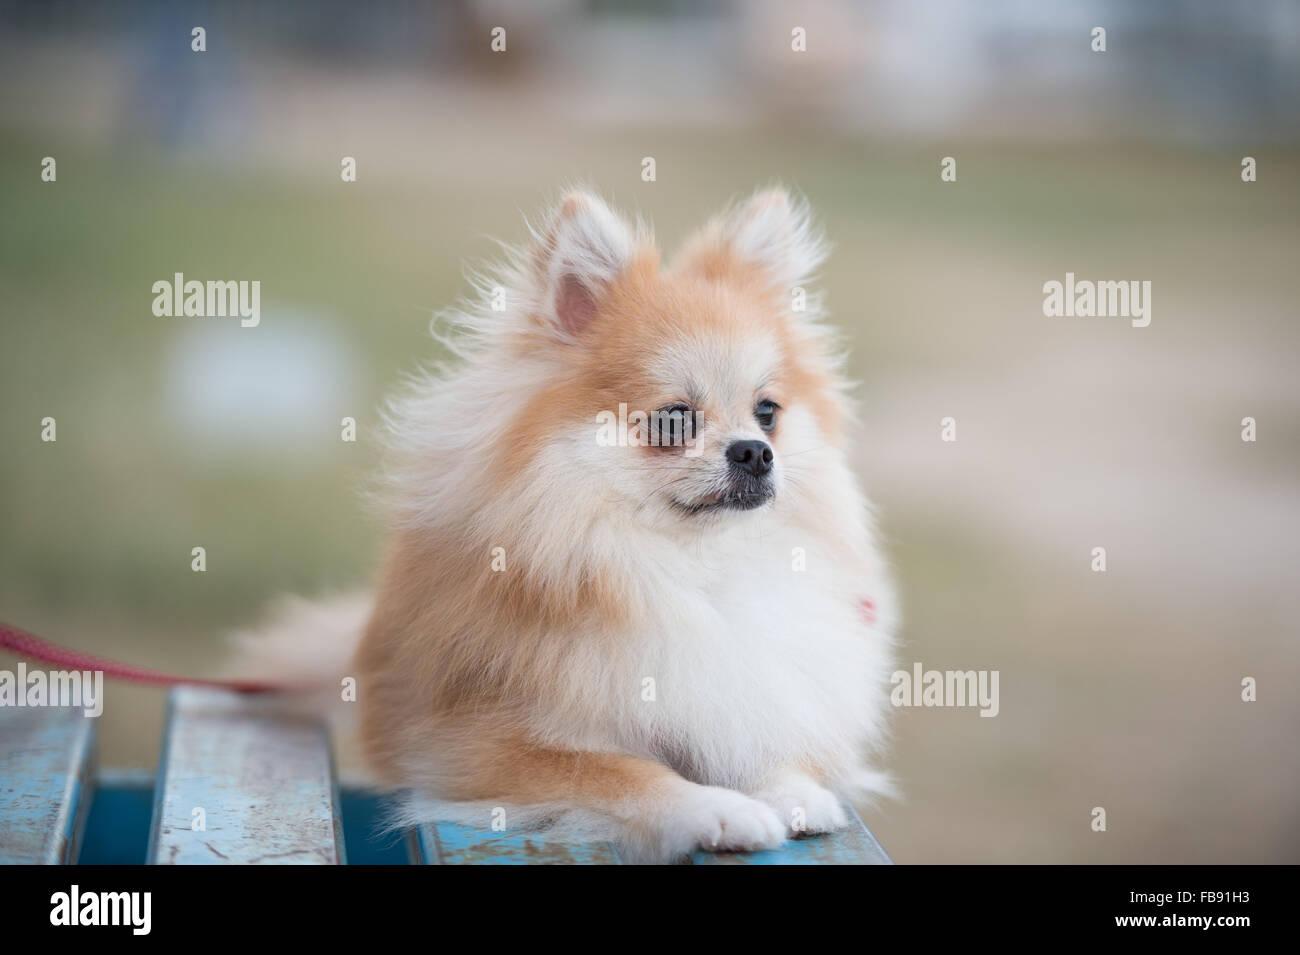 Pomeranian Dog Sitting On Amphitheater Stock Photo 93011887 Alamy